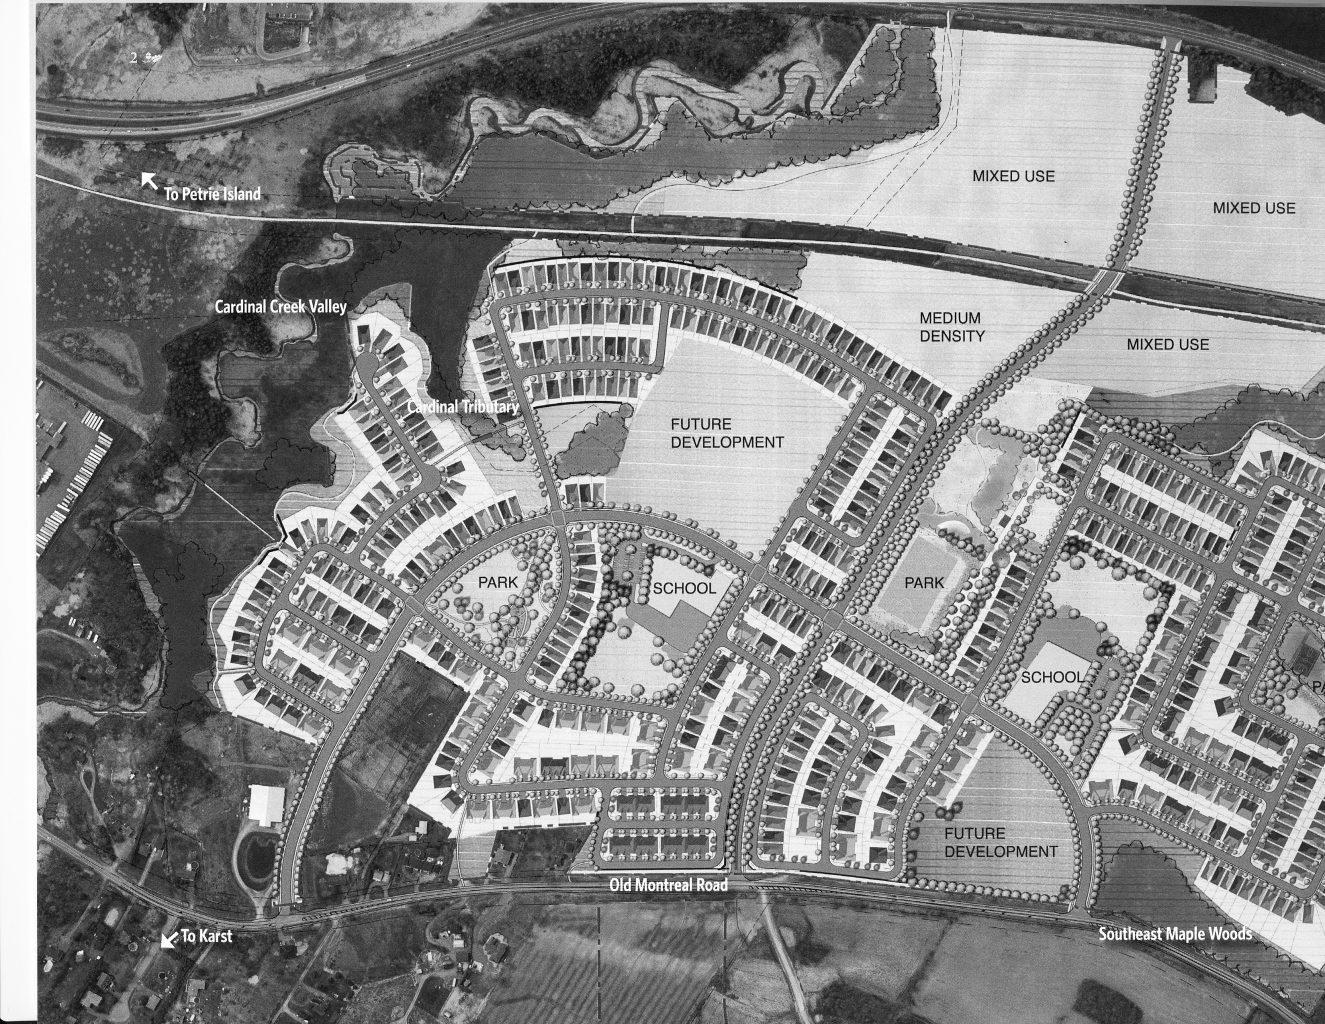 Cardinal Creek Village